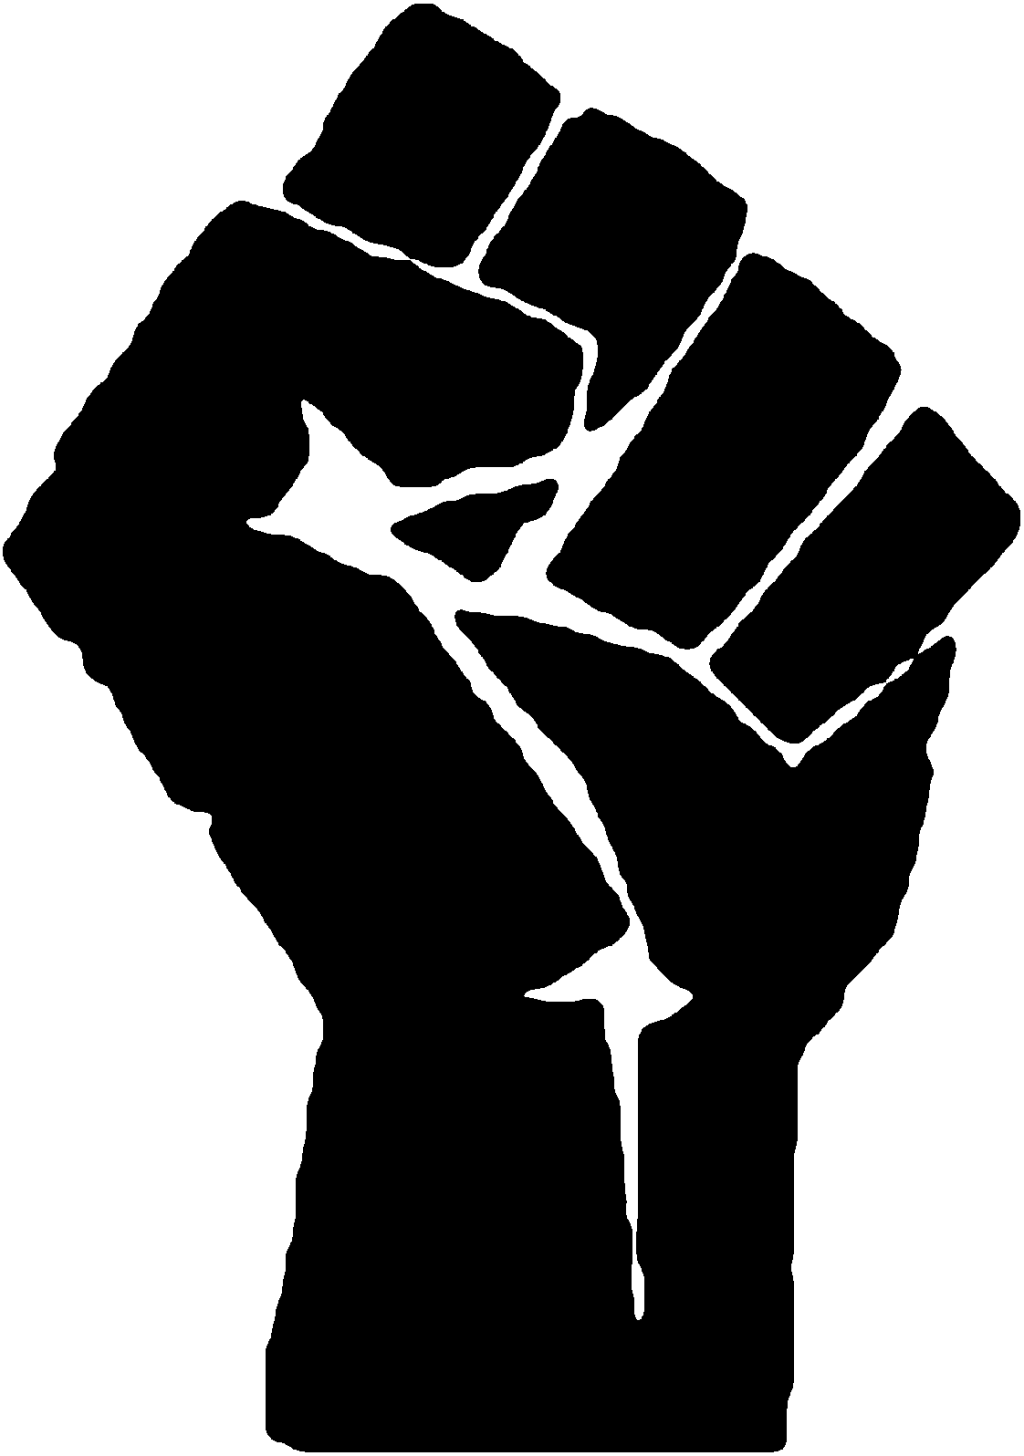 bw-fist